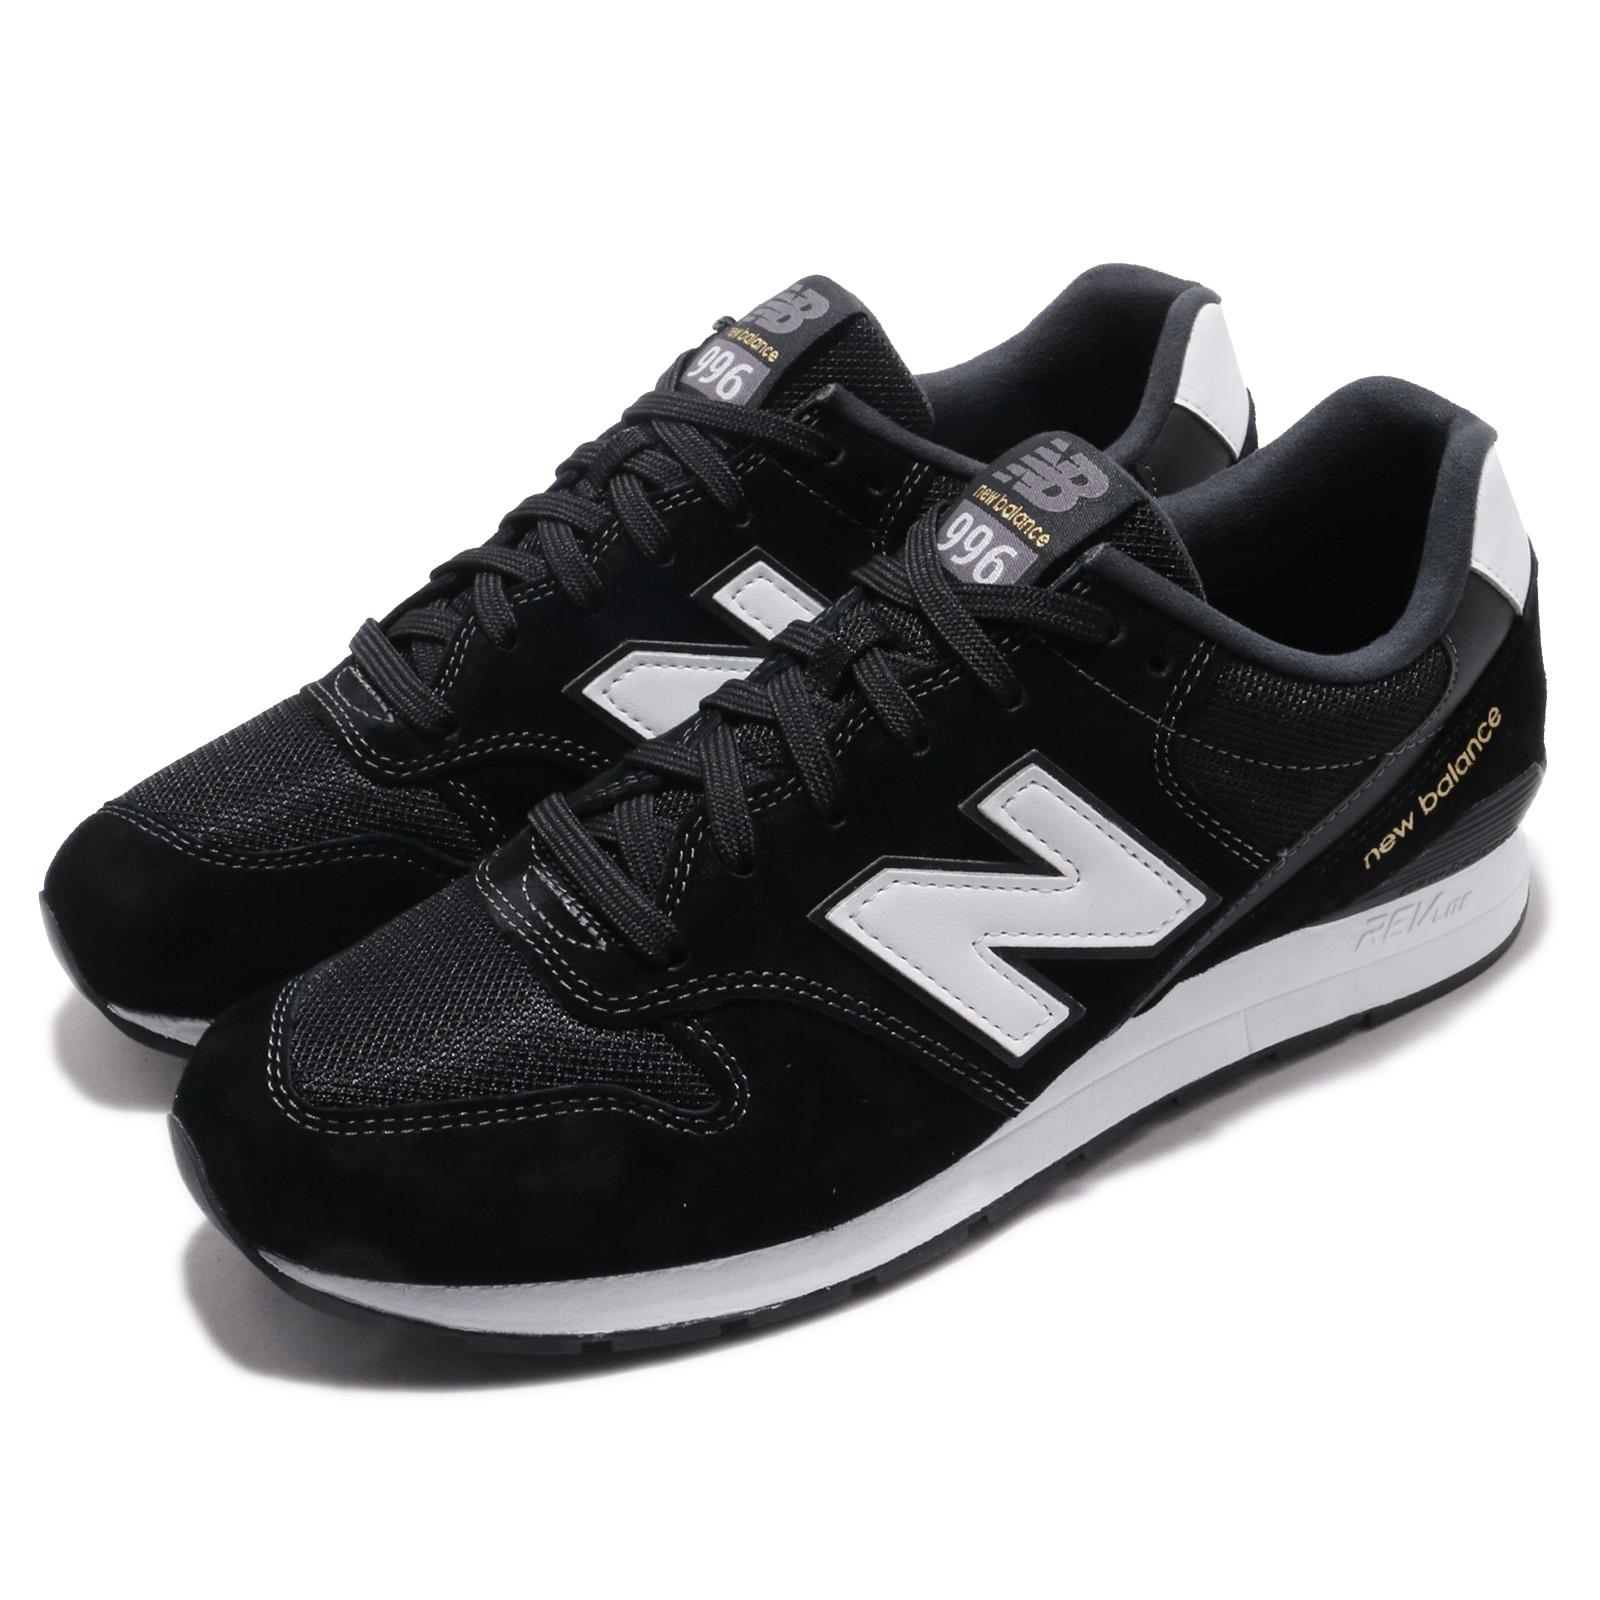 New Balance MRL996PK D Black White Gold